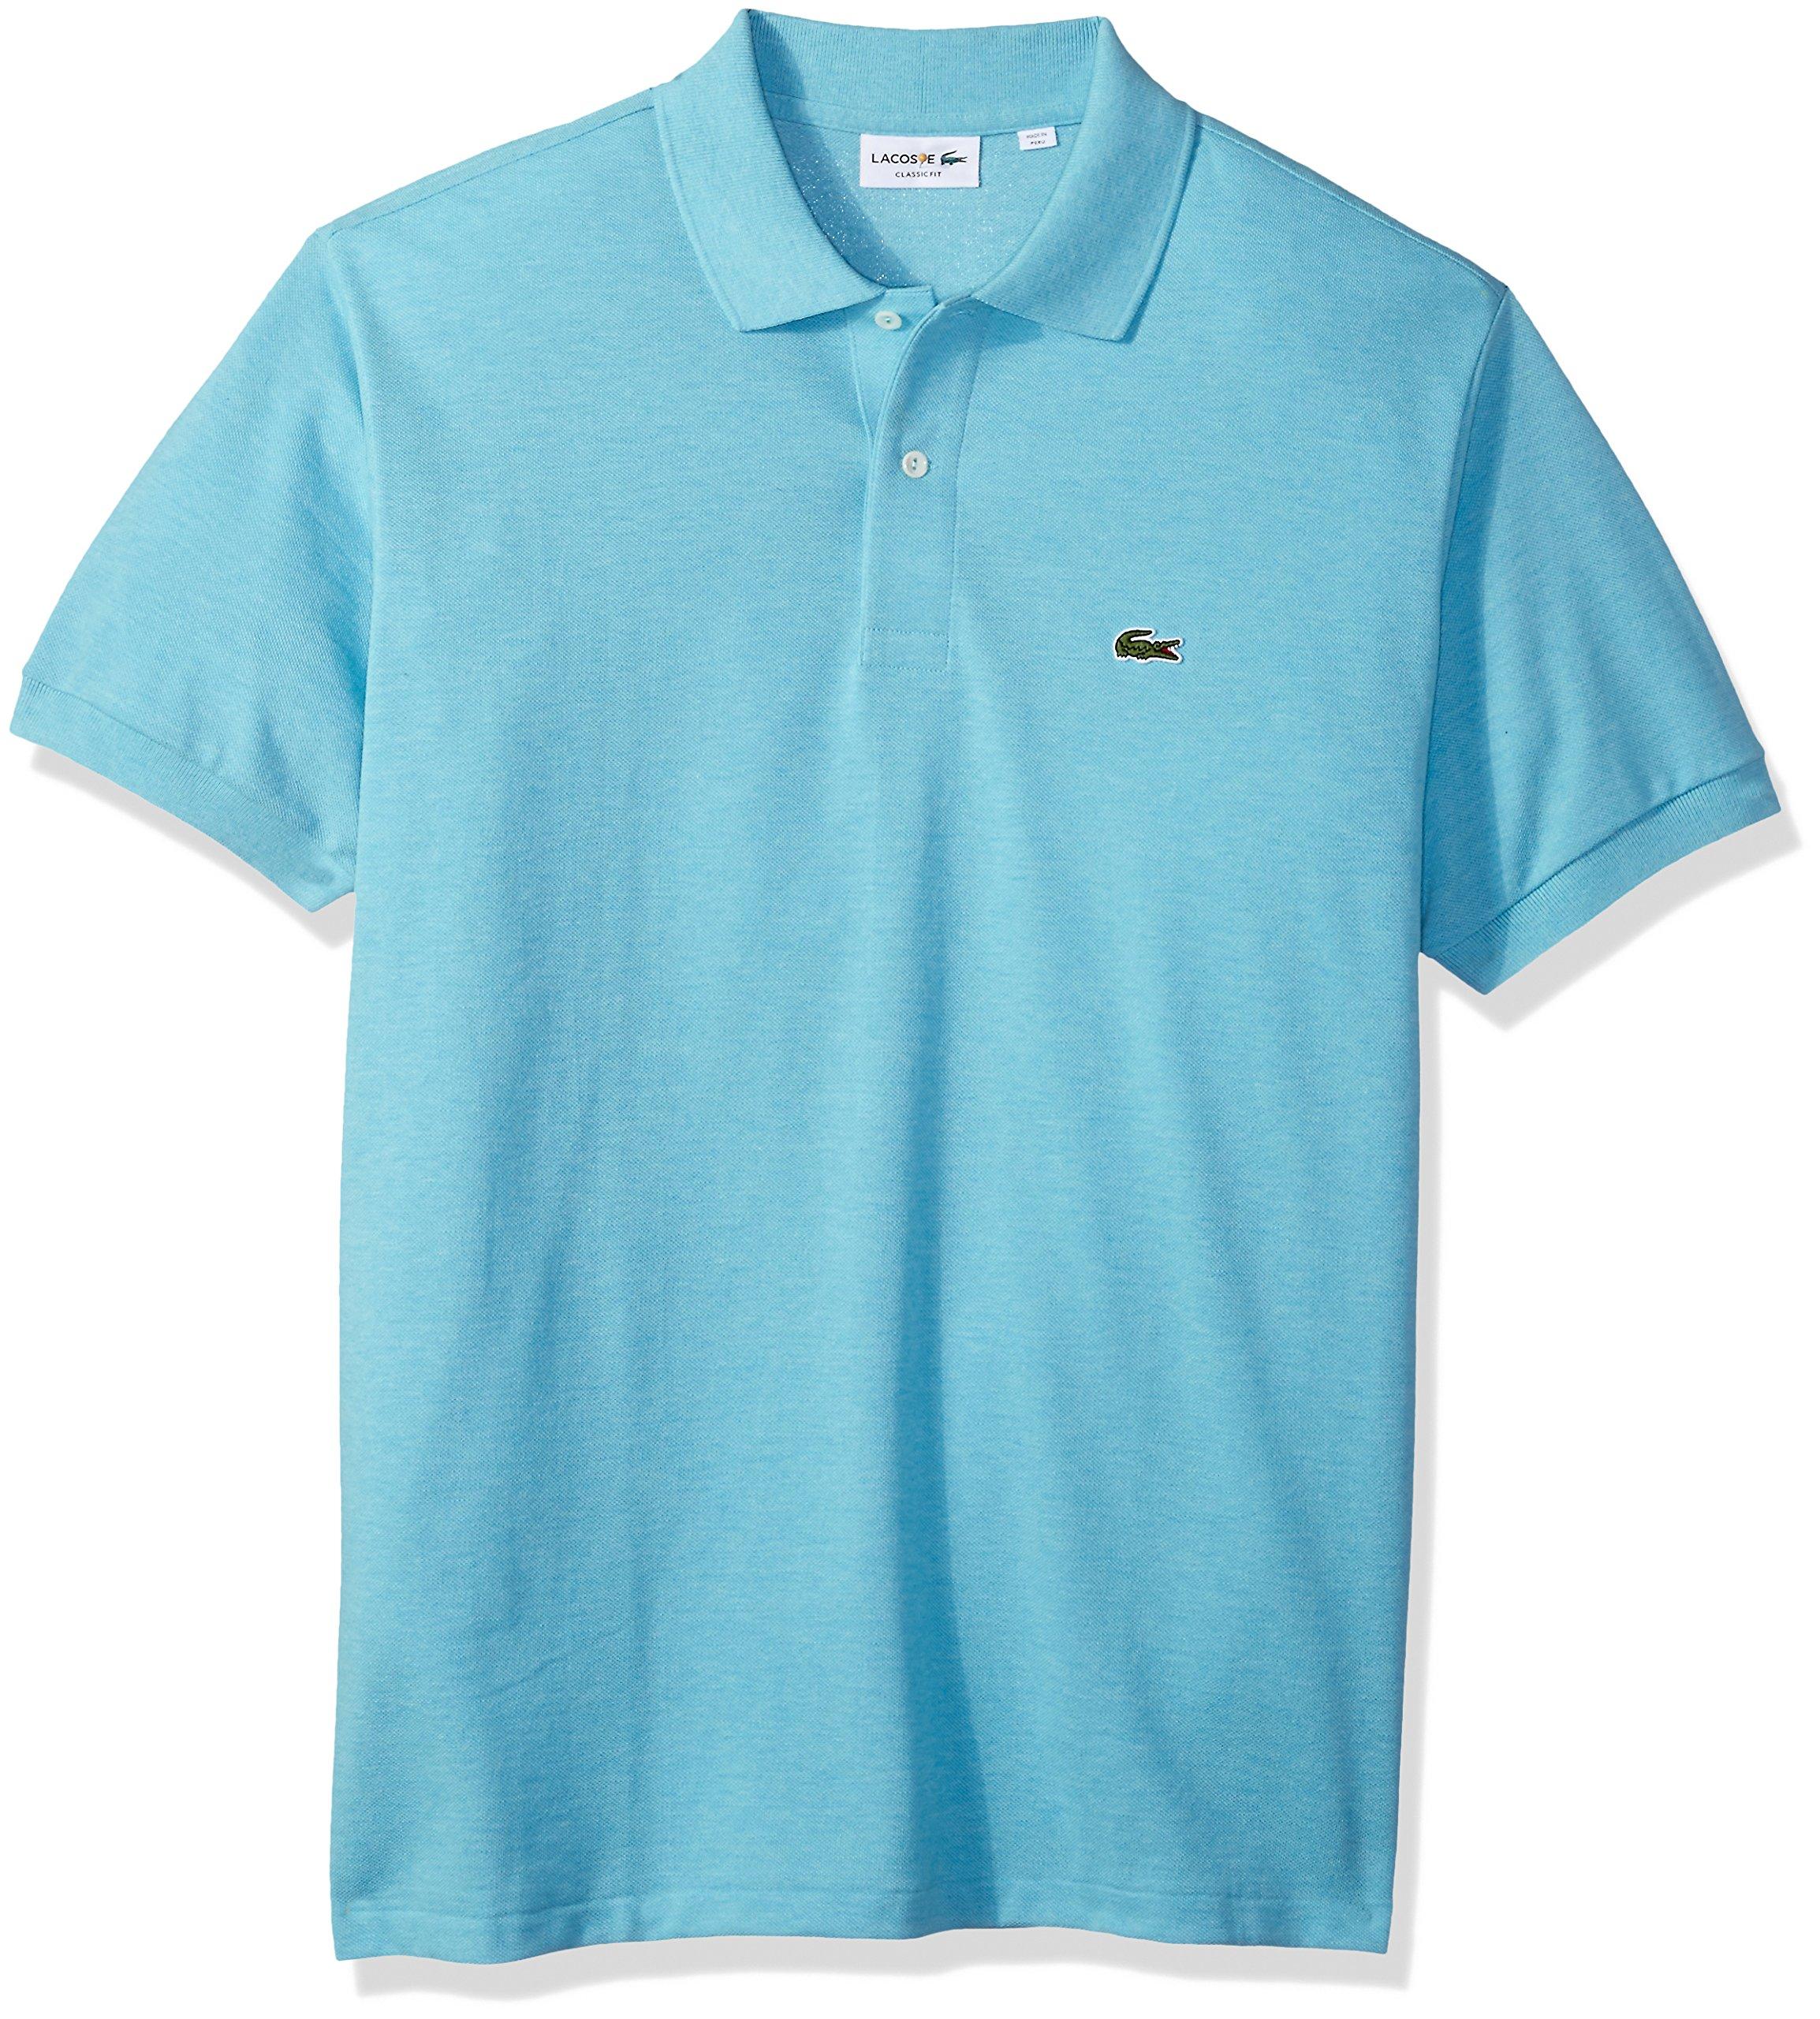 NCAA Marquette Golden Eagles RYLMAR07 Unisex Slapshot Vintage Jersey T-Shirt